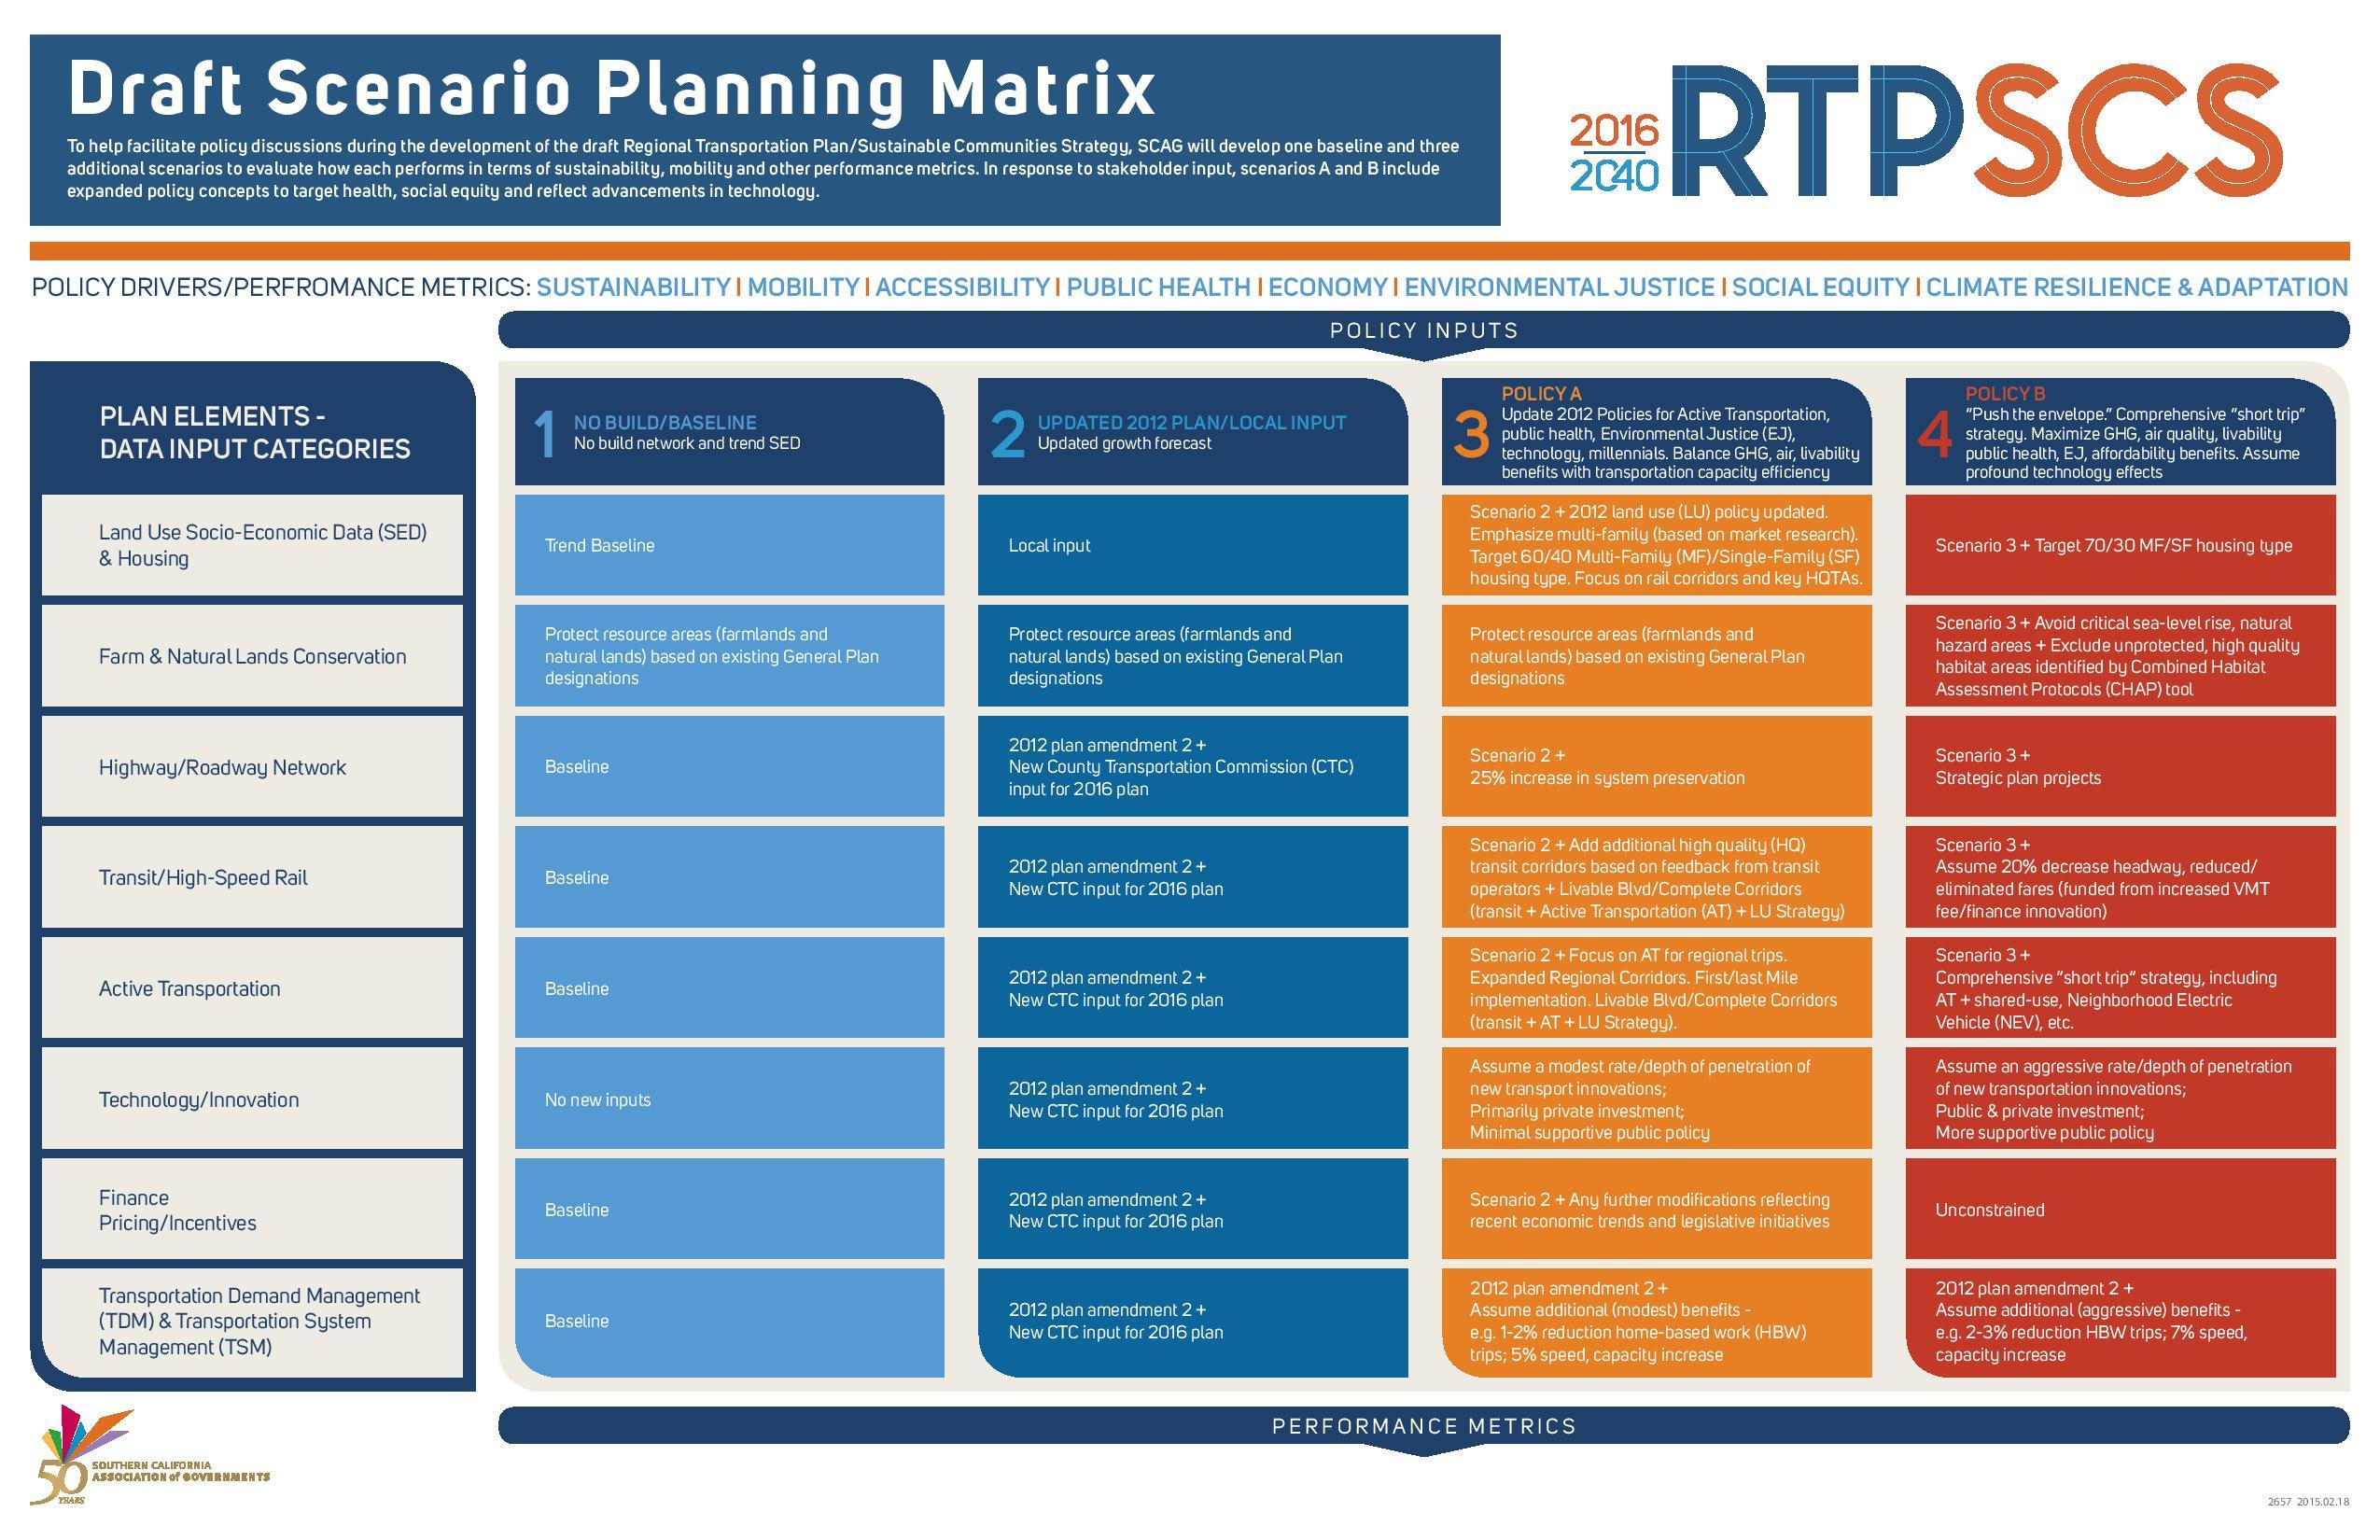 scag update  2016 regional transportation plan  u0026 sustainable communities strategy underway